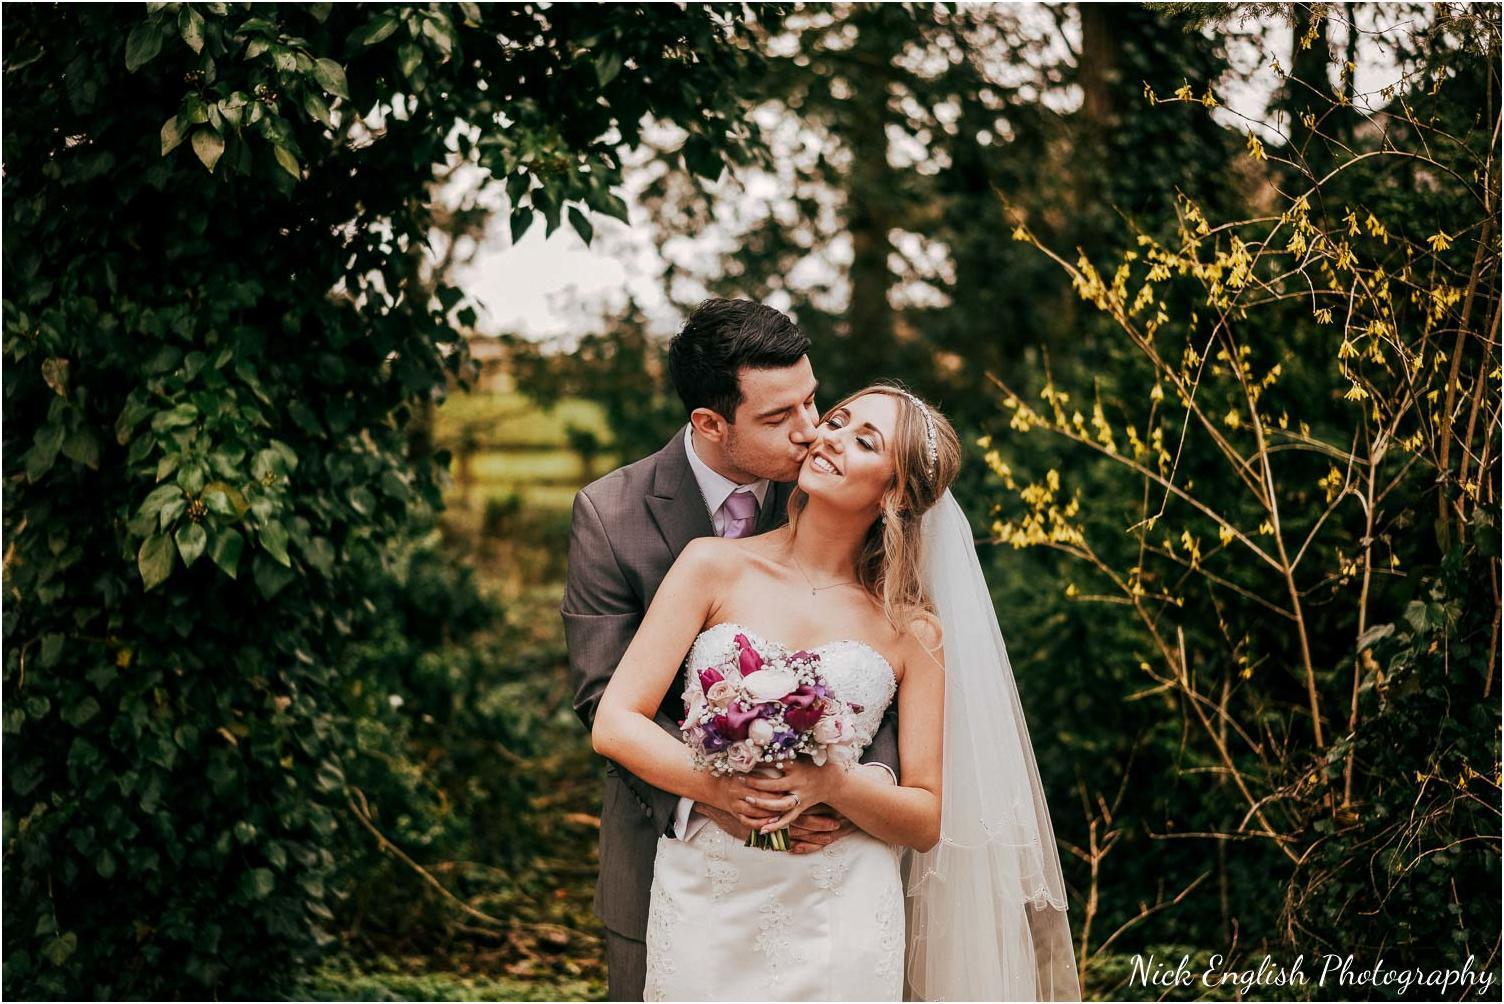 Mitton_Hall_Wedding_Photographer_2018-111.jpg